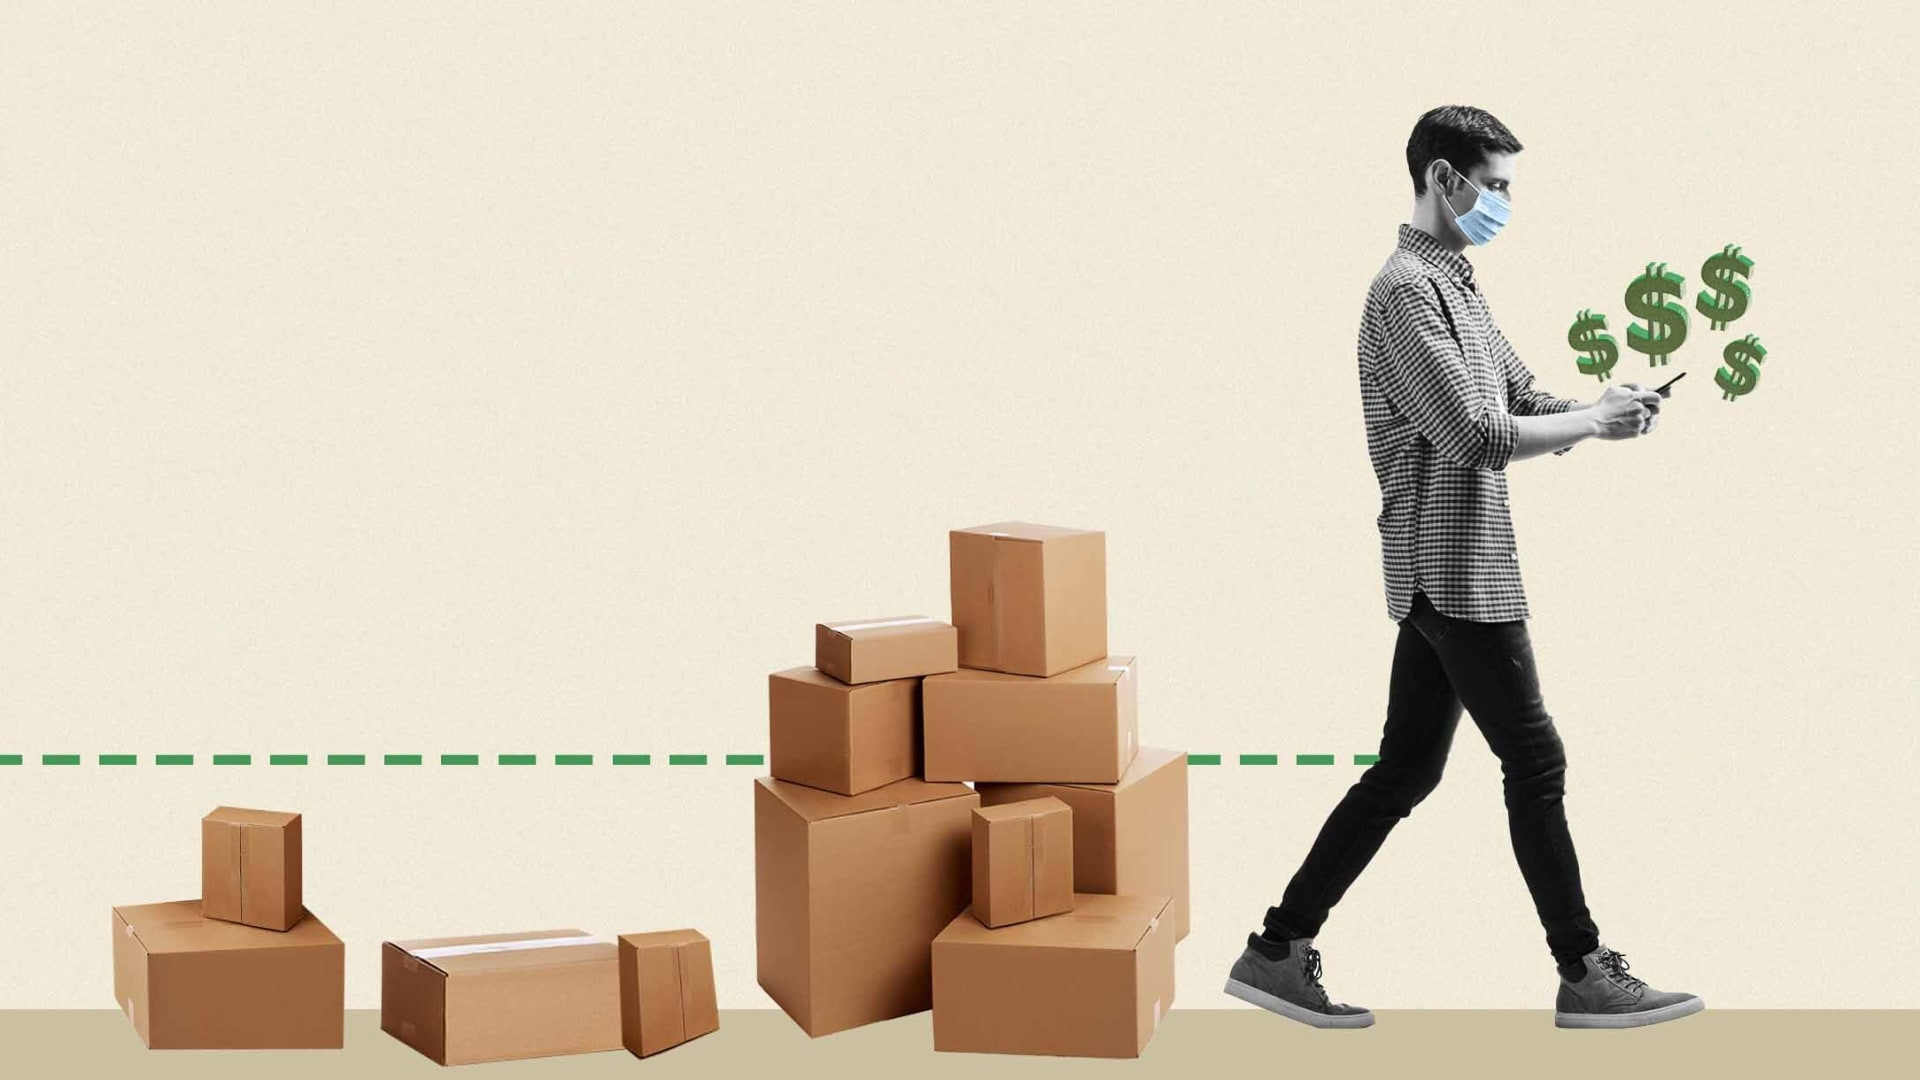 4 Ways Covid-19 Has Changed Online Consumer Behavior